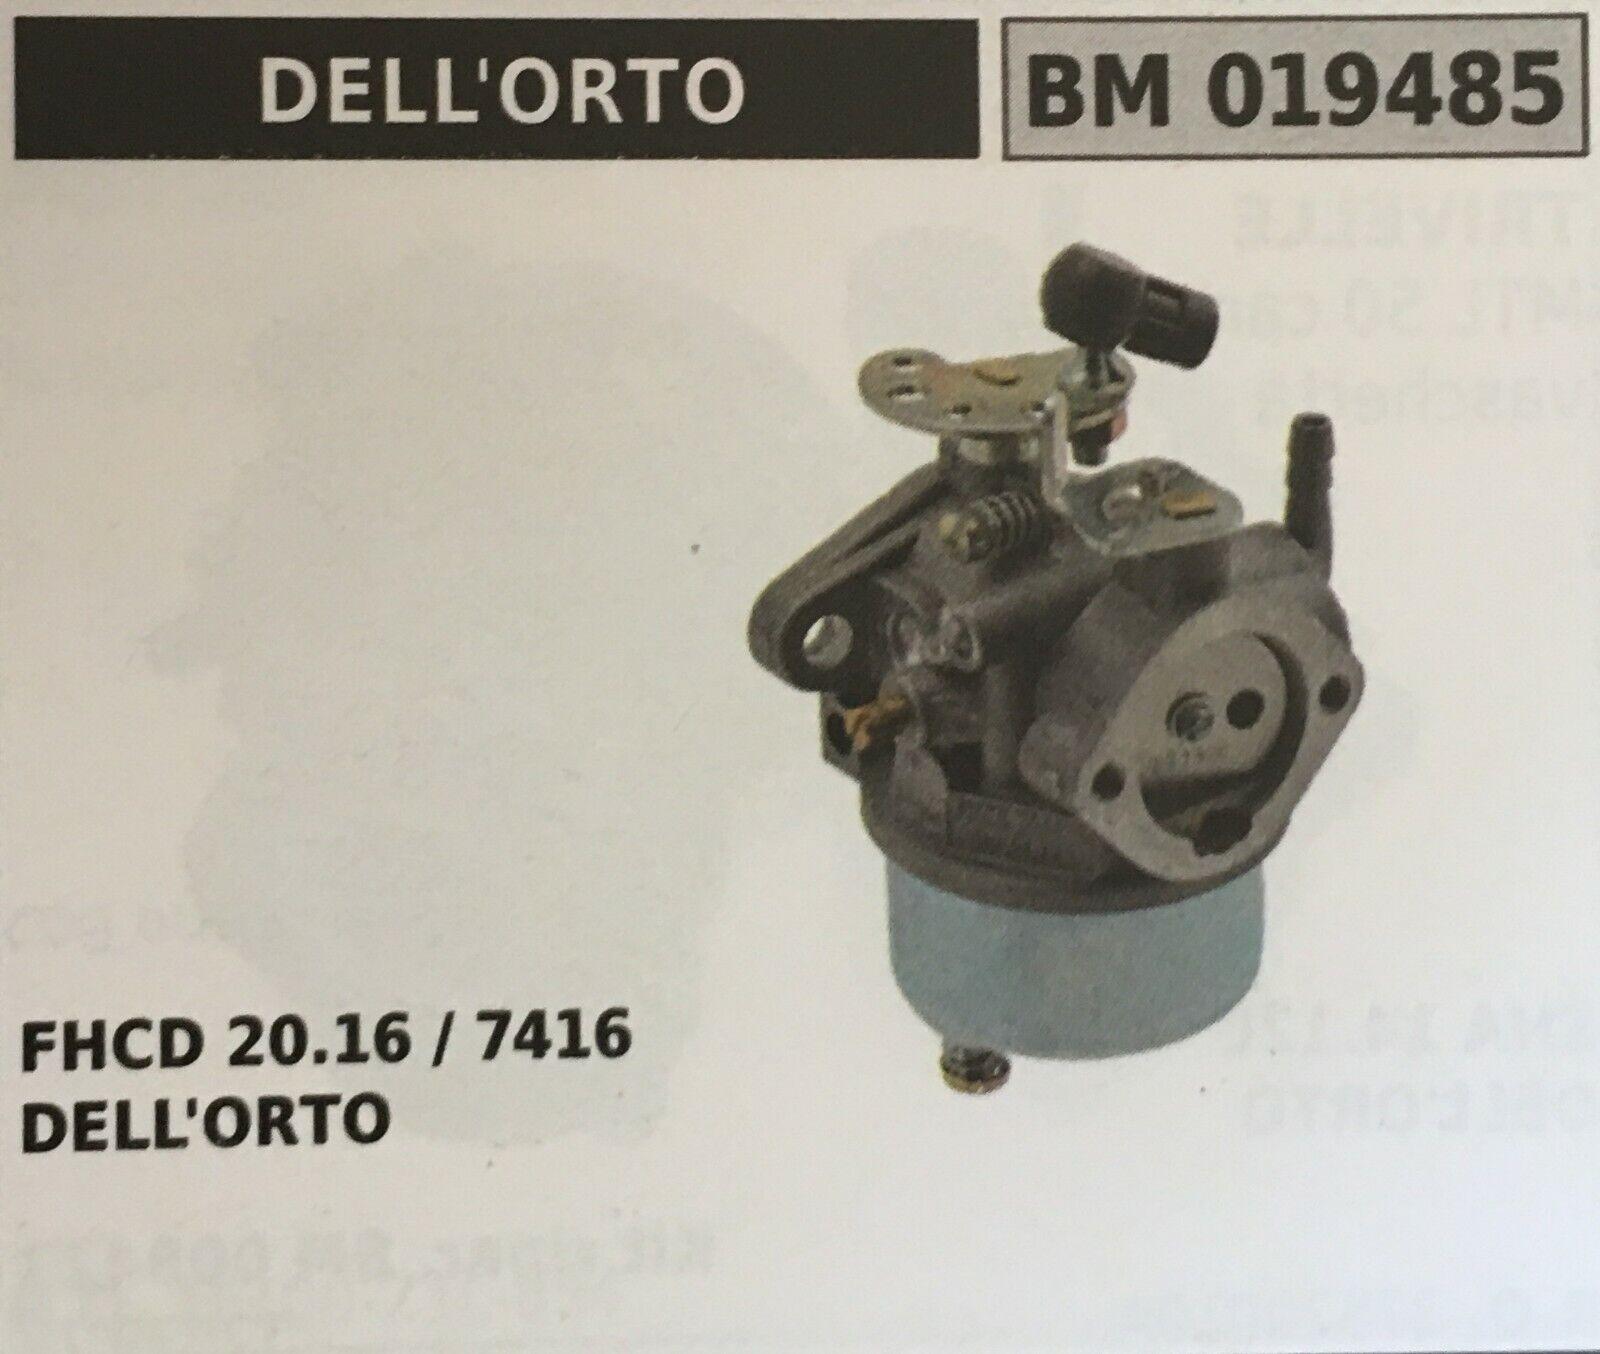 Cocheburador a Tanque Brumar Dell'Orto BM019485